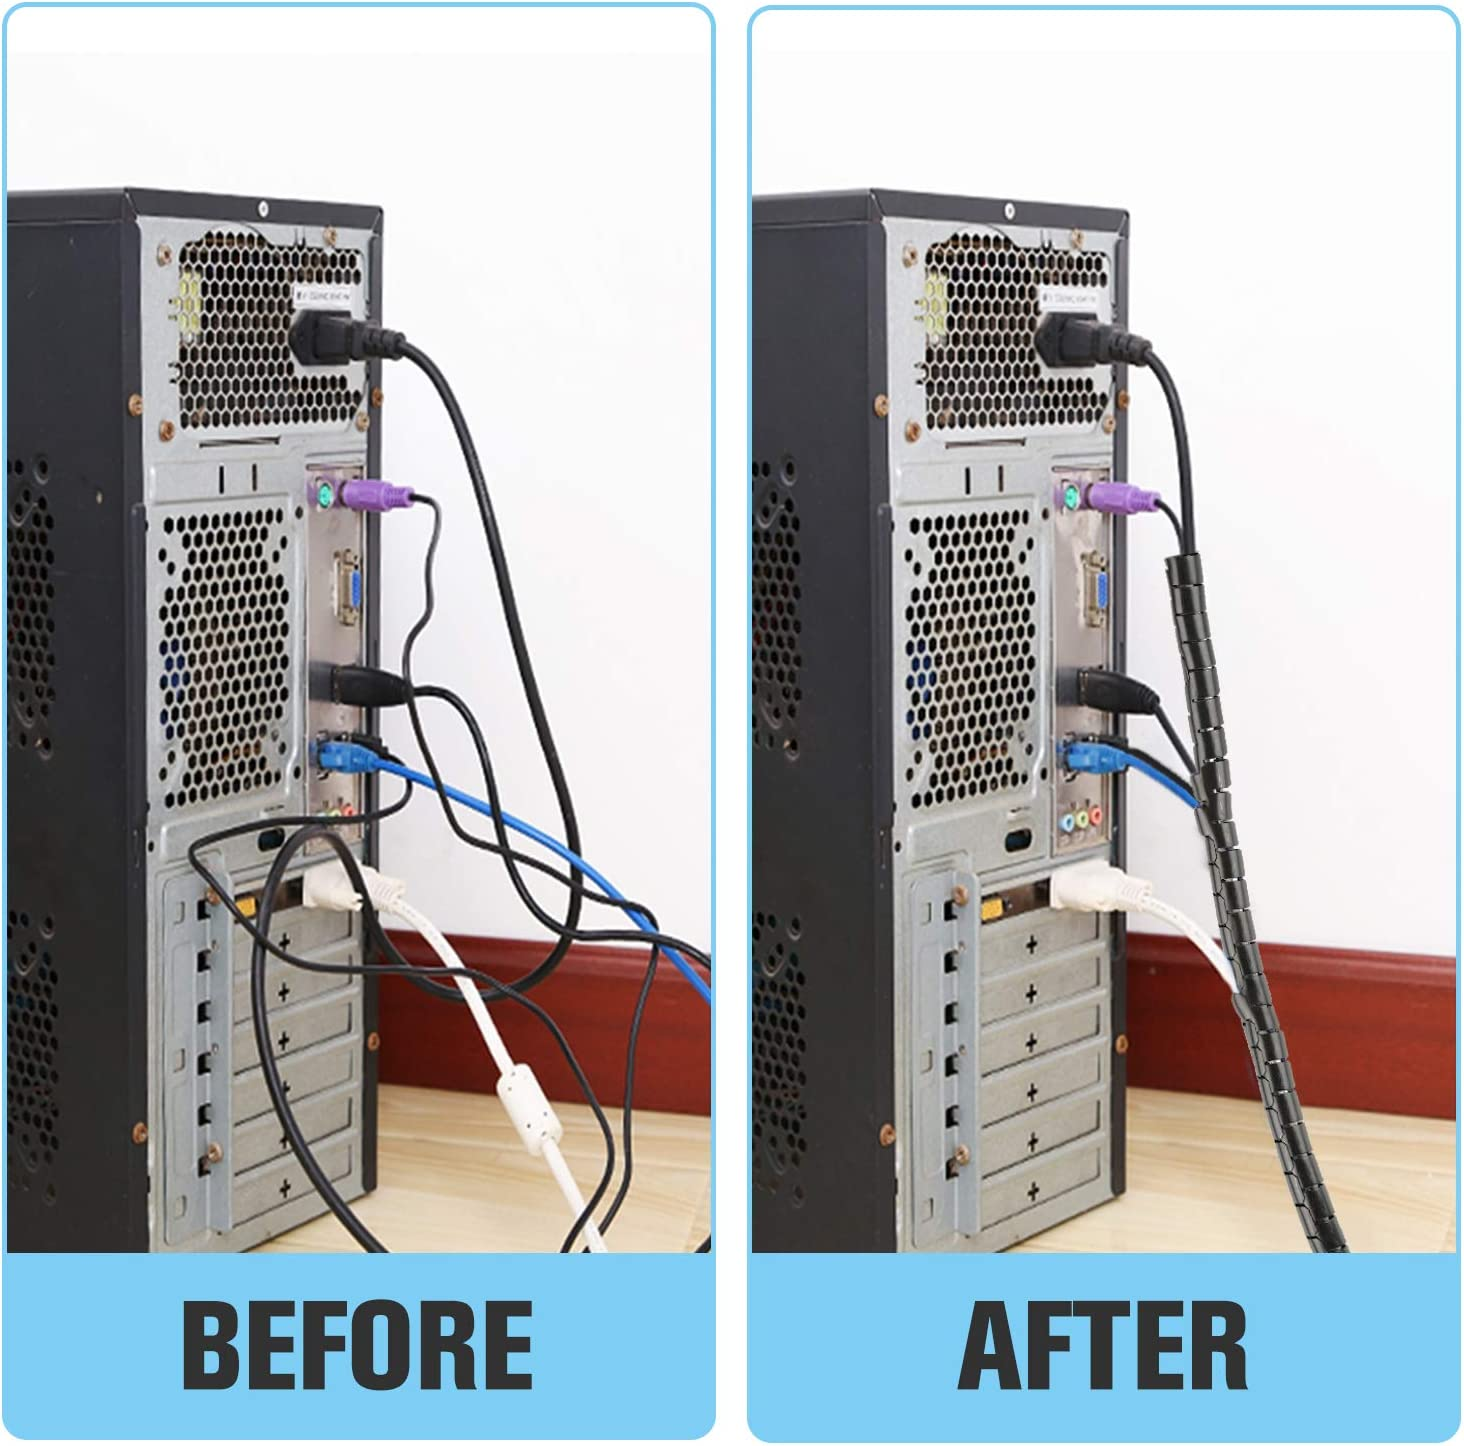 Computadora Negro Autom/ático Cubre Cables Para TV 2 X 1.5m Recoge Cables de Material PET /∅ 22 und /∅16 mm VoJoPi Organizador Cables